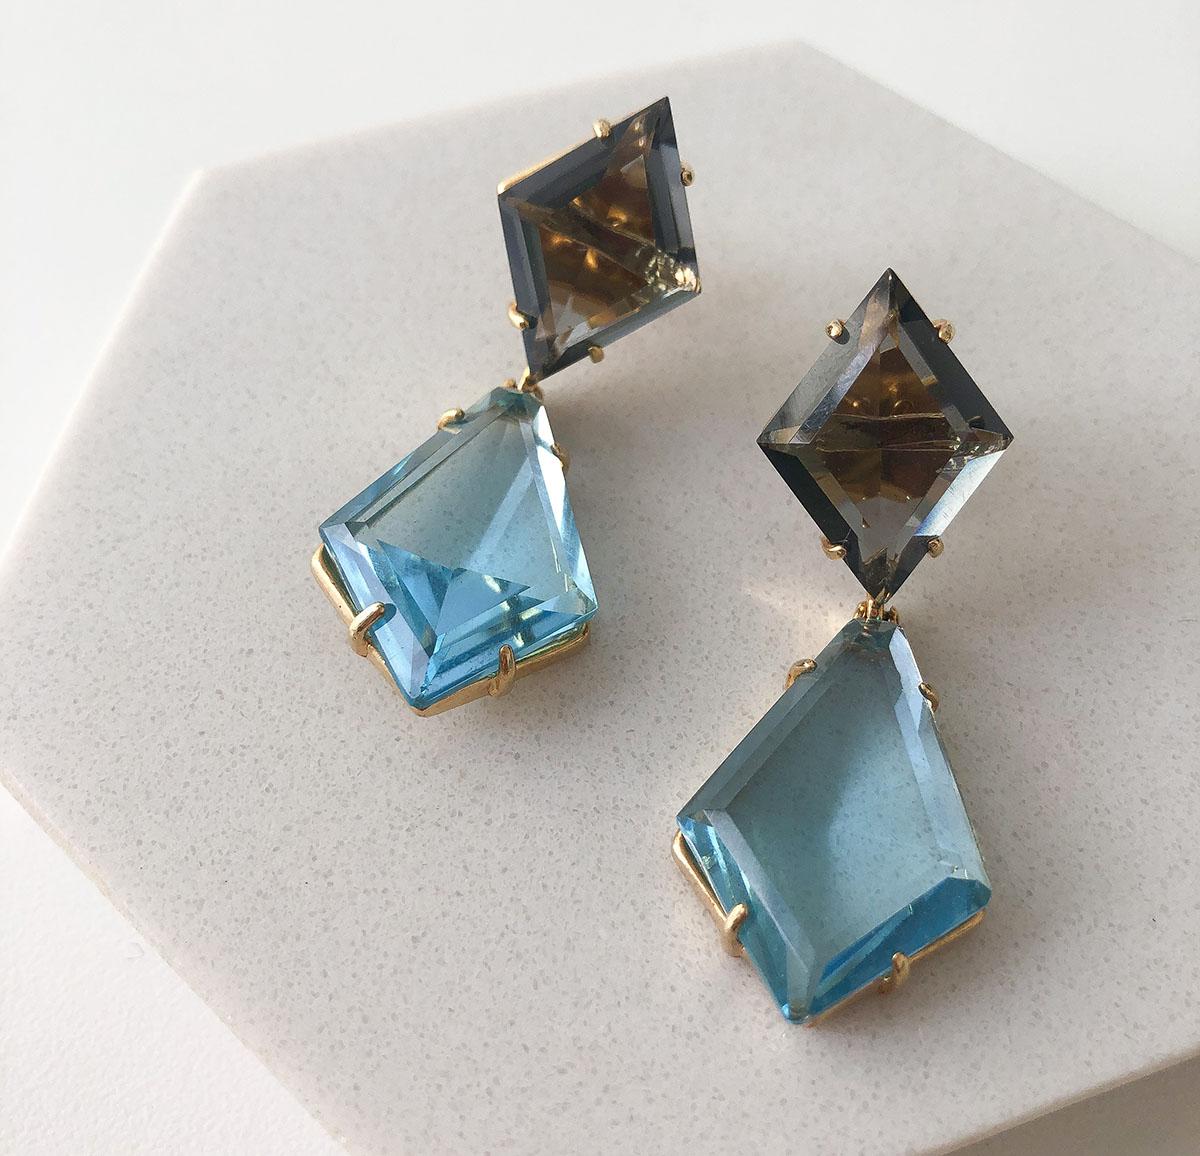 Brinco Bijuteria Pedra Losango Fumê e Azul Claro